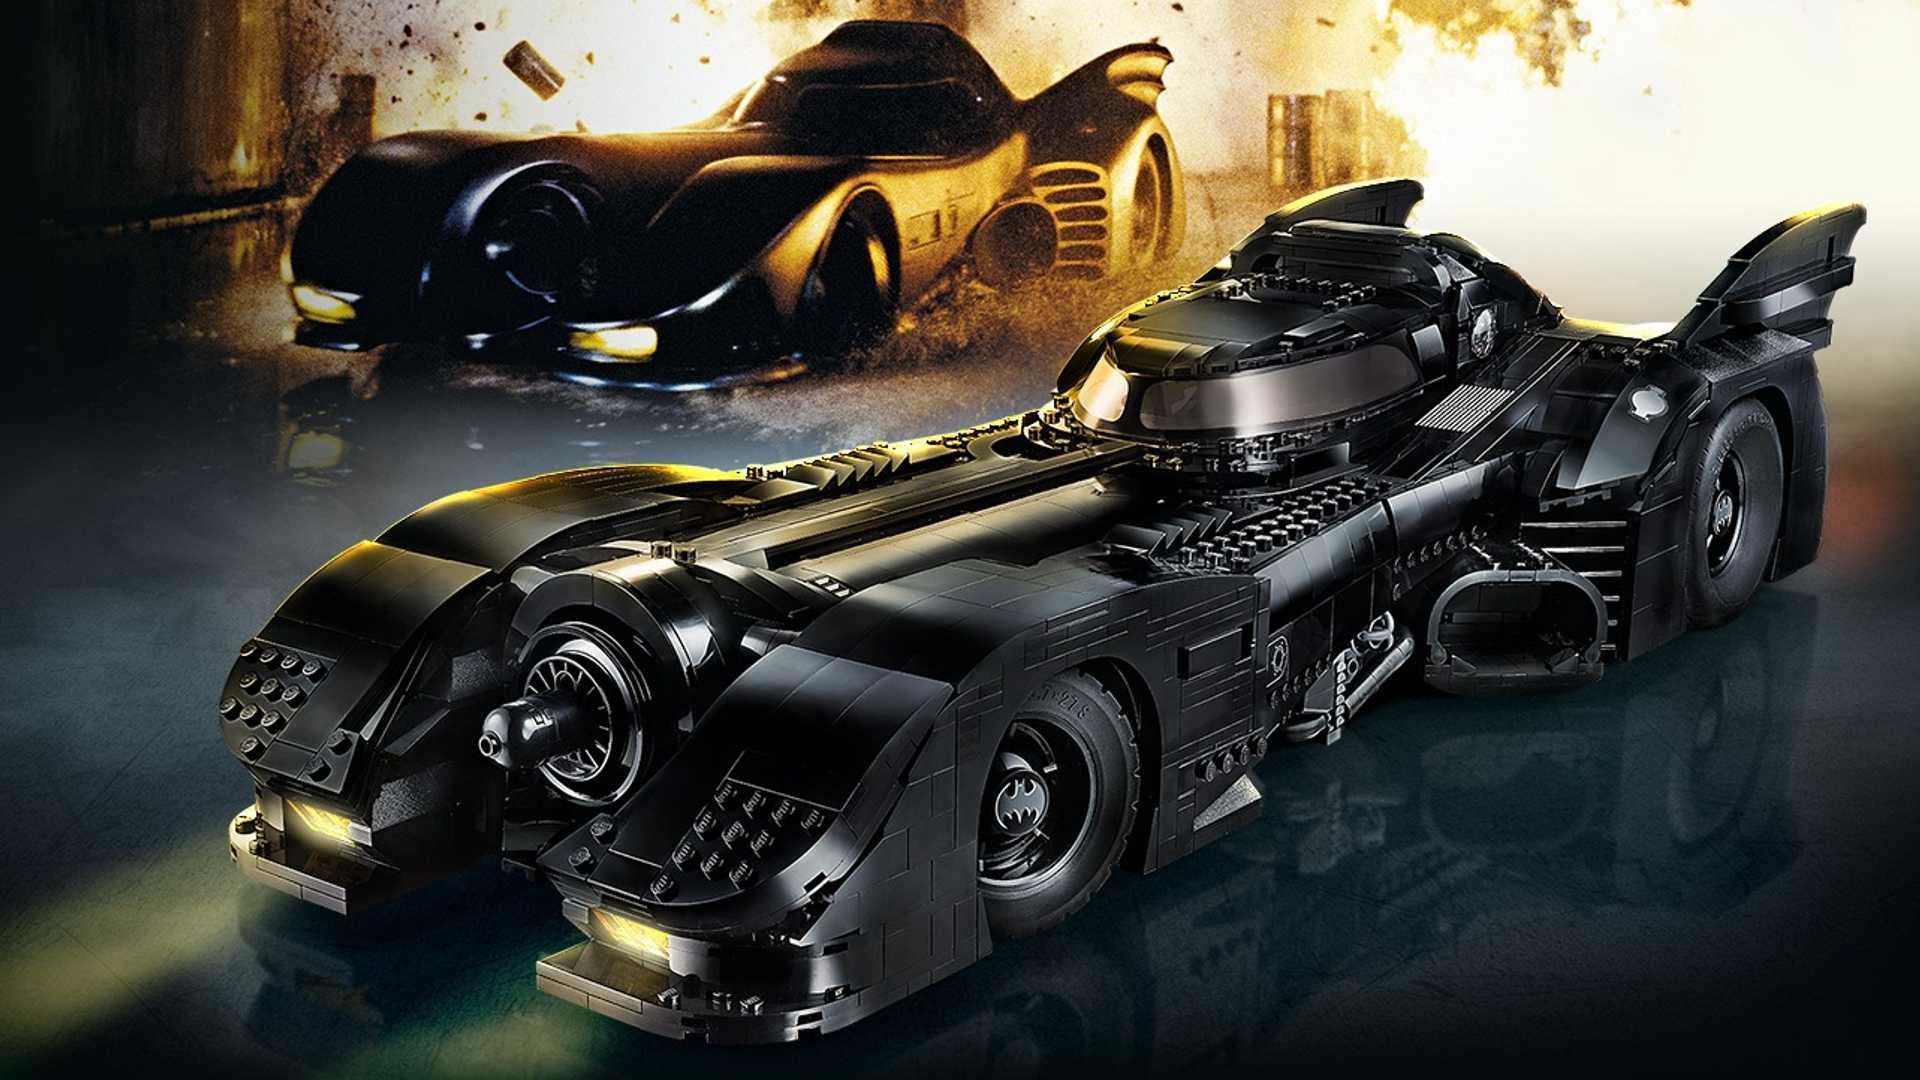 Lego-Batmobile-kit-1989-23